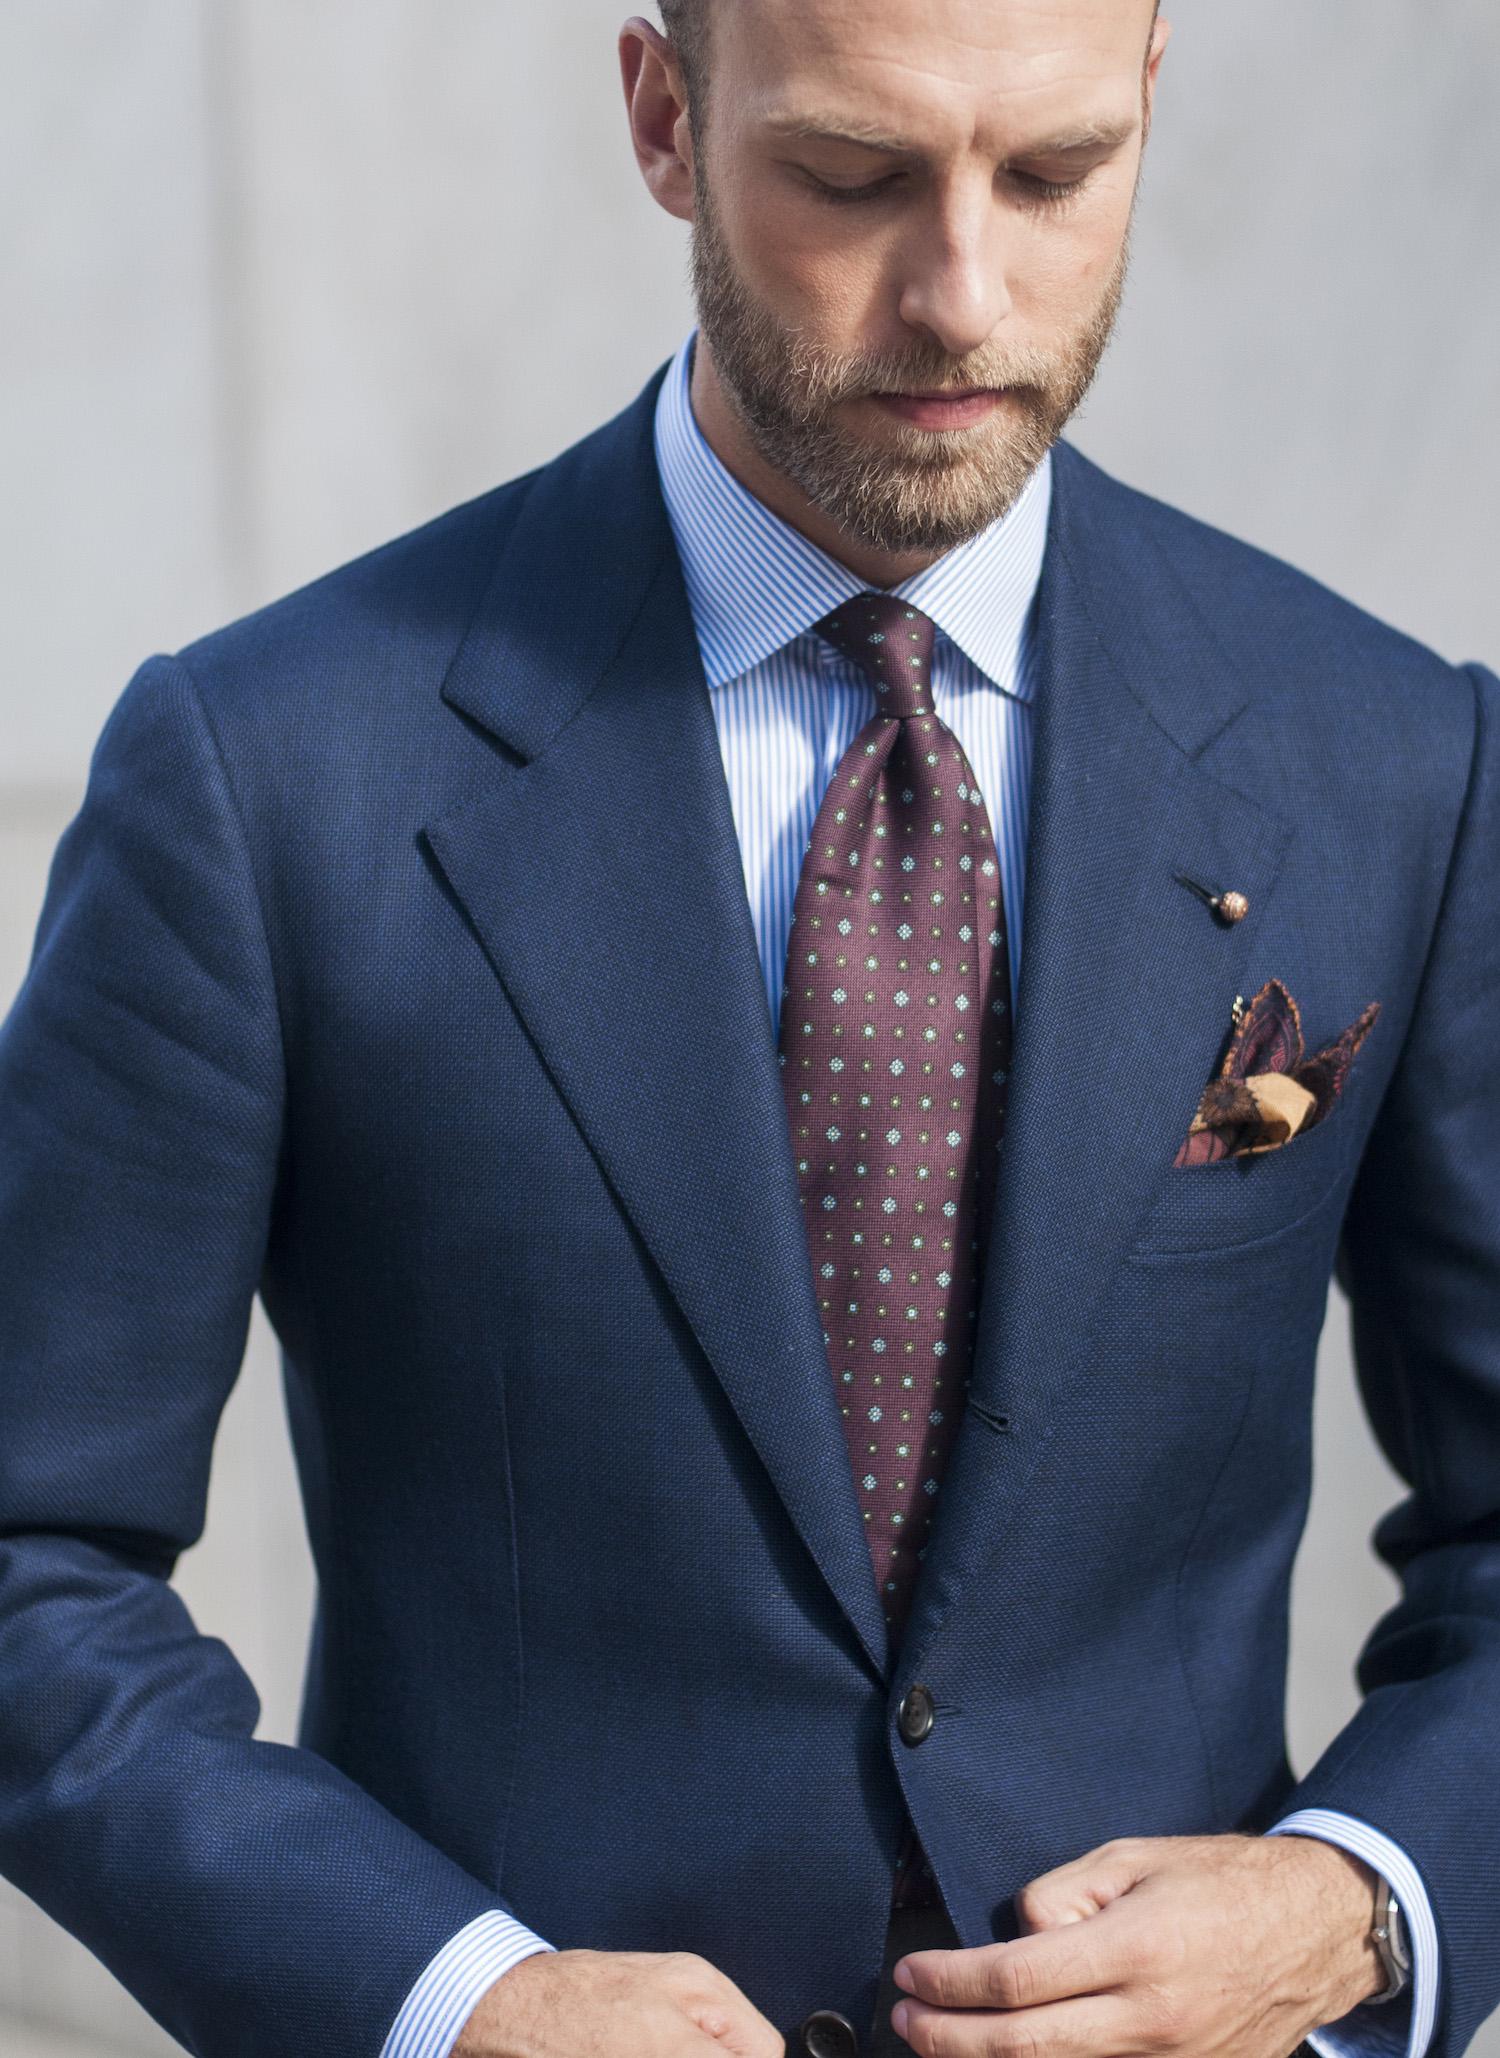 Best Suit Shirt Tie Combinations For Interview Fertilizer Society